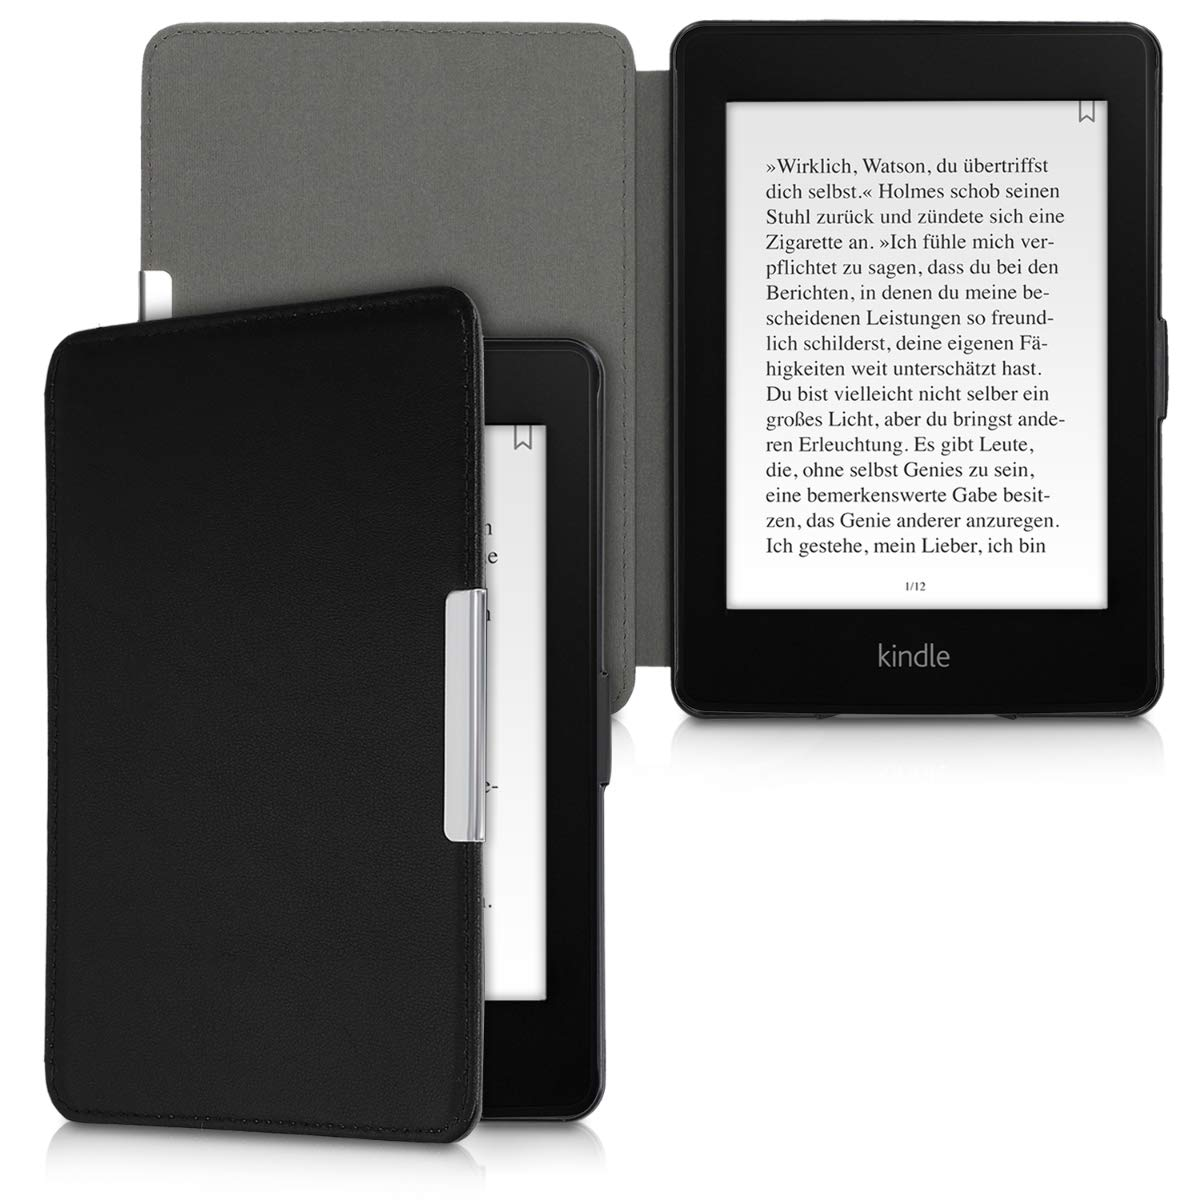 kalibri Funda para Amazon Kindle Paperwhite: Amazon.es: Electrónica